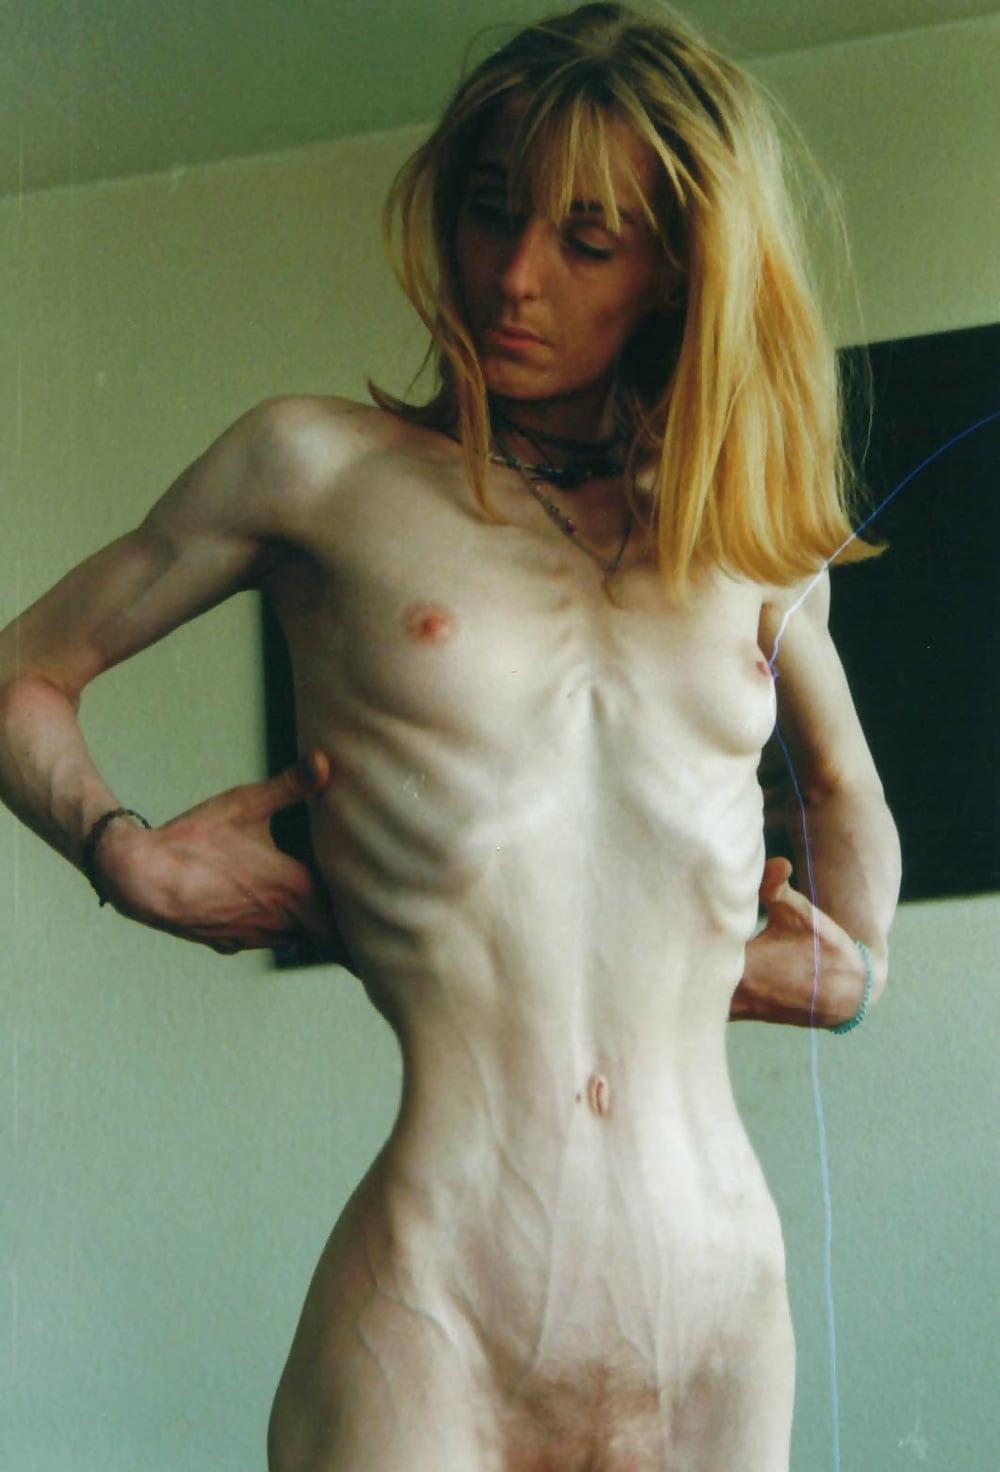 anoreksiya-foto-golih-devushek-pushki-seks-video